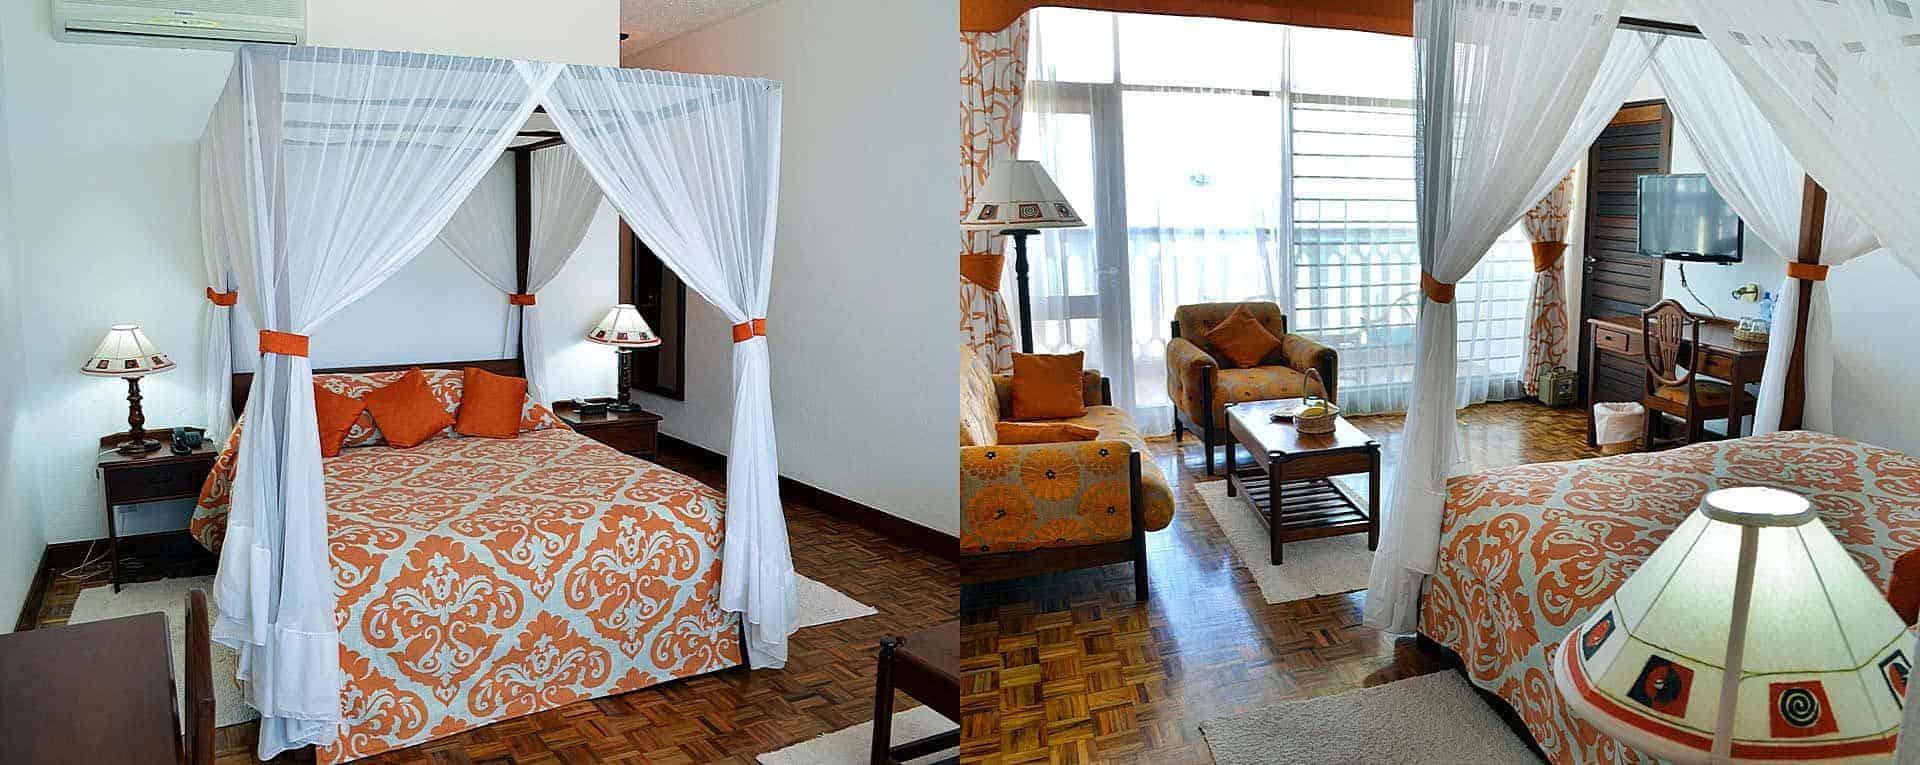 Travellers beach hotel and club Mombasa 2